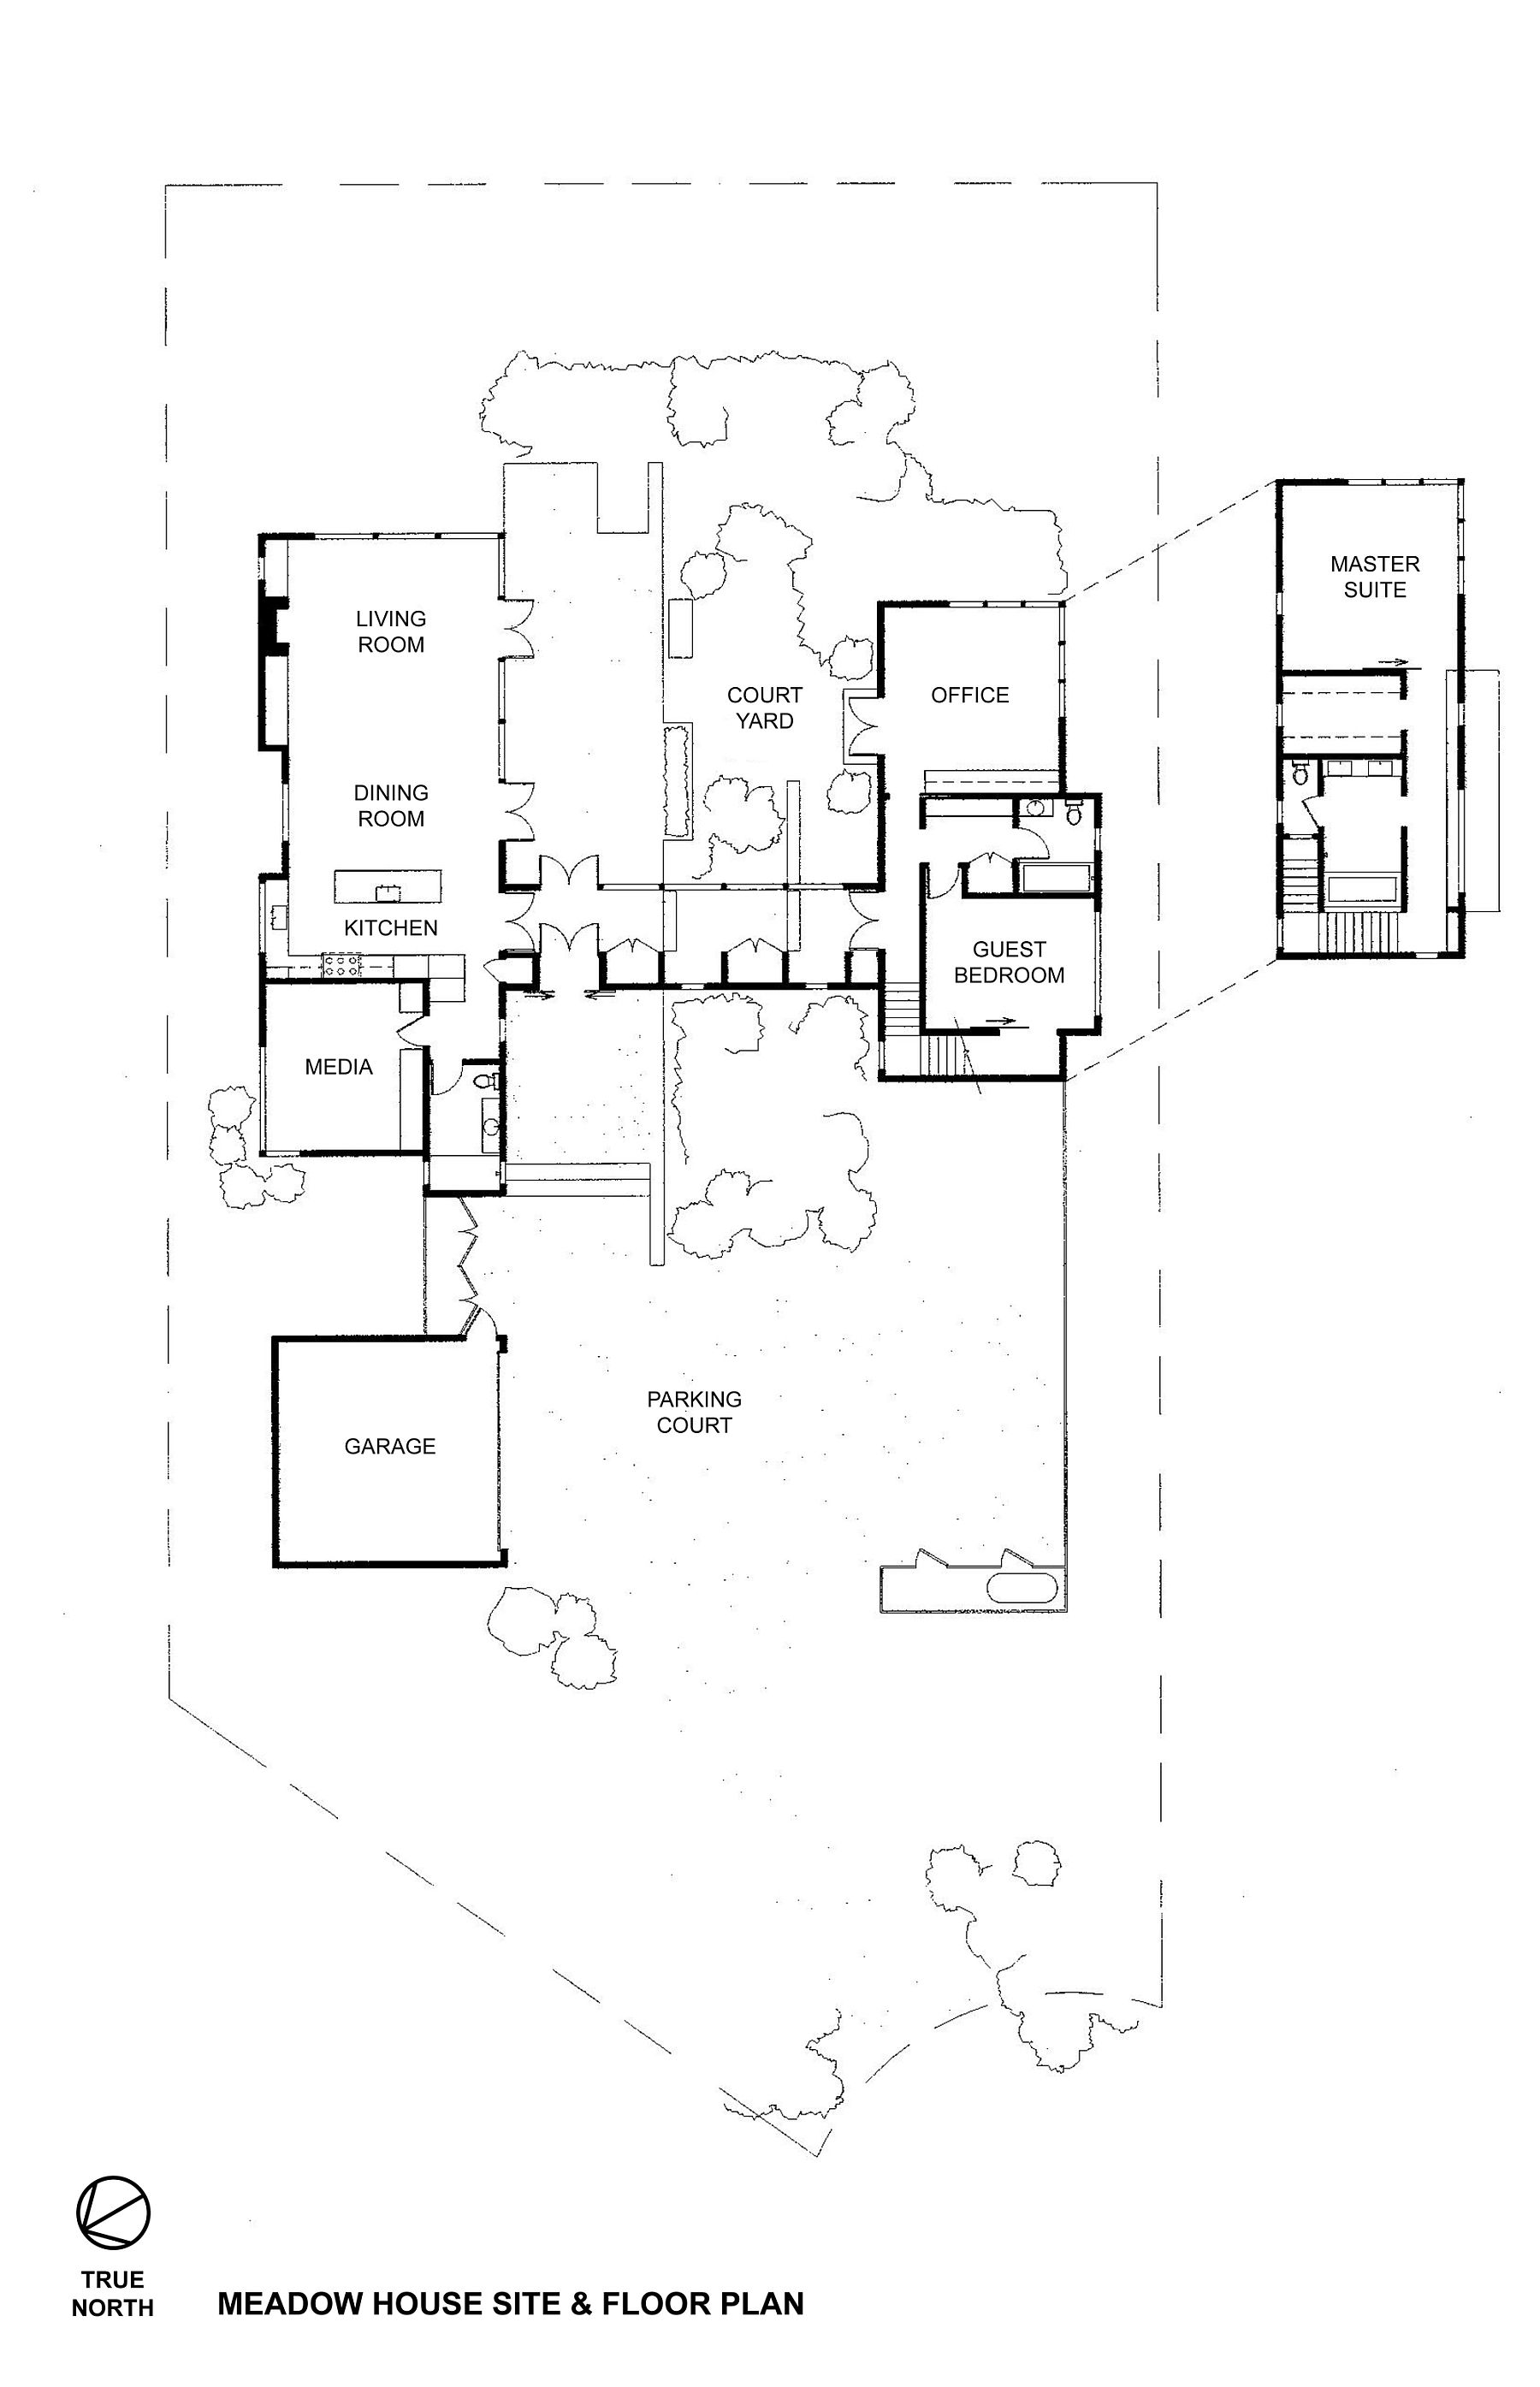 Meadow House Floor Plan